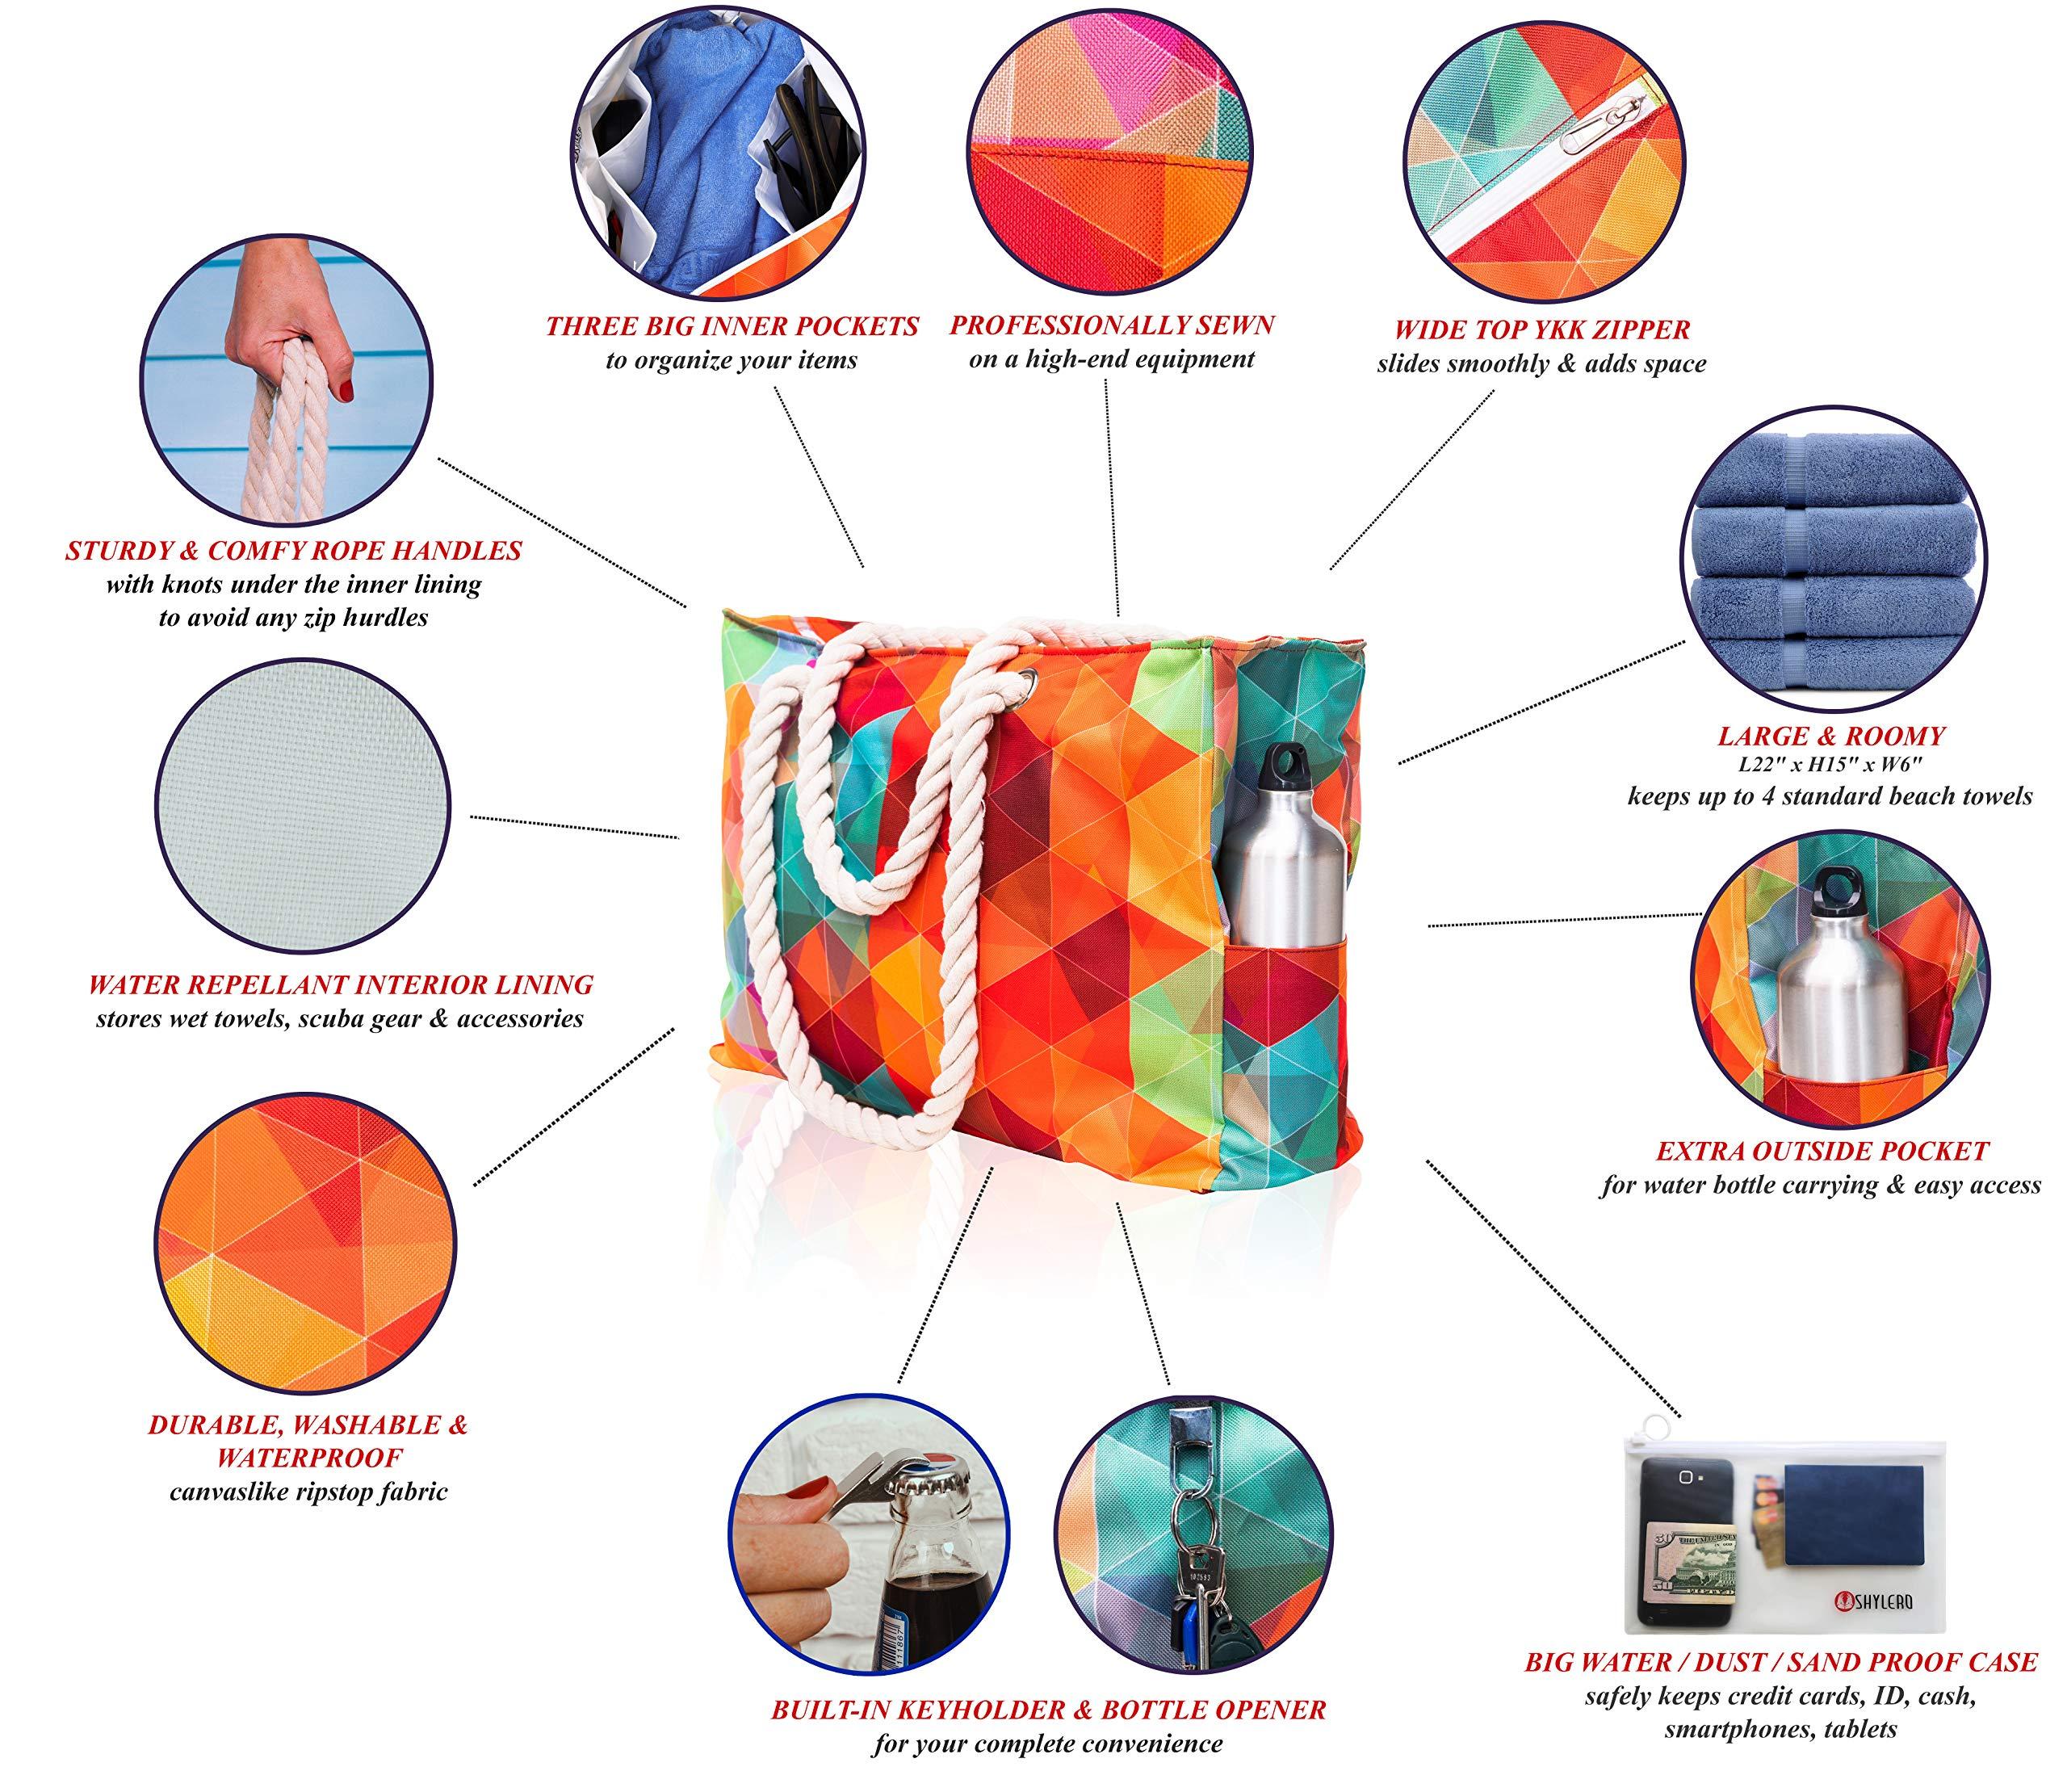 Beach Bag XL. Waterproof (IP64). L22 xH15 xW6 w Cotton Rope Handles, Top Zip, Two Outside Pockets. Vibrant Rainbow Tote Has Waterproof Phone Case, Built-in Key Holder, Bottle Opener